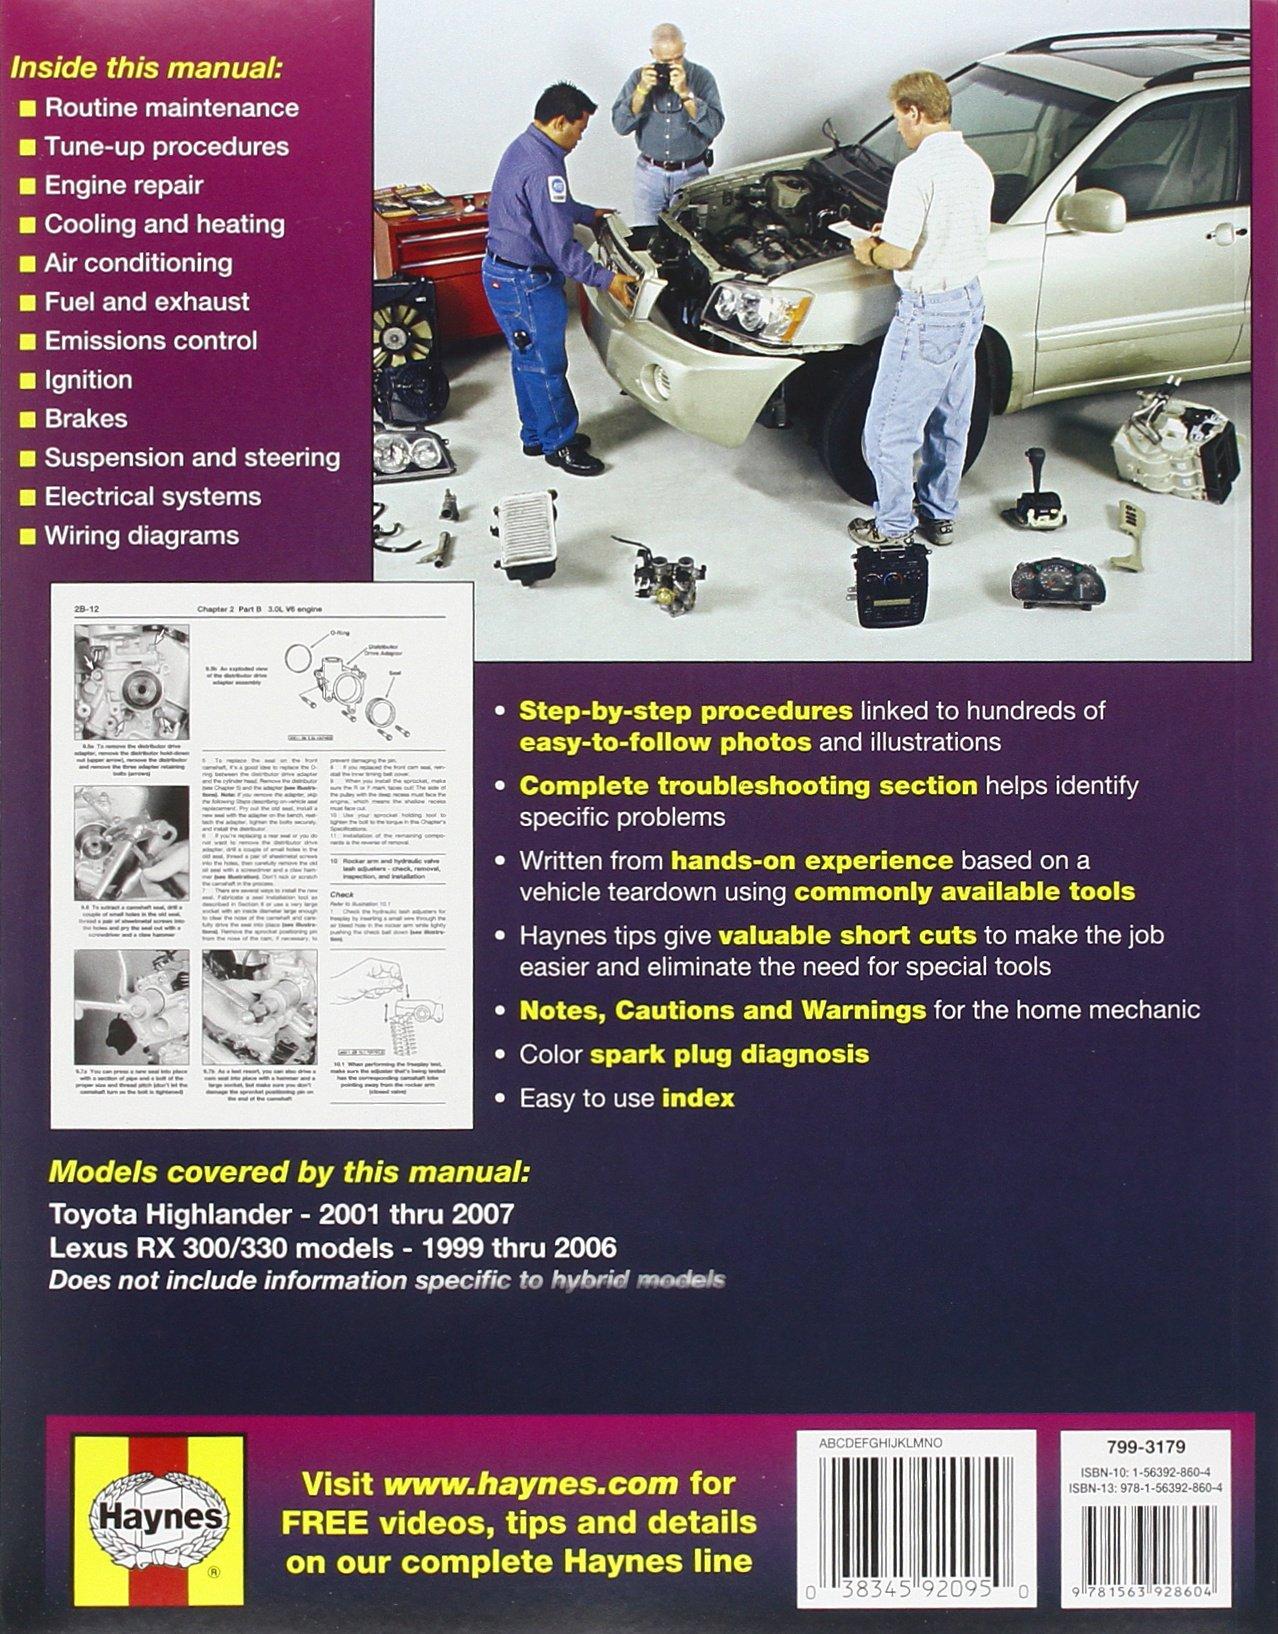 Toyota Highlander Service Manual: Precaution